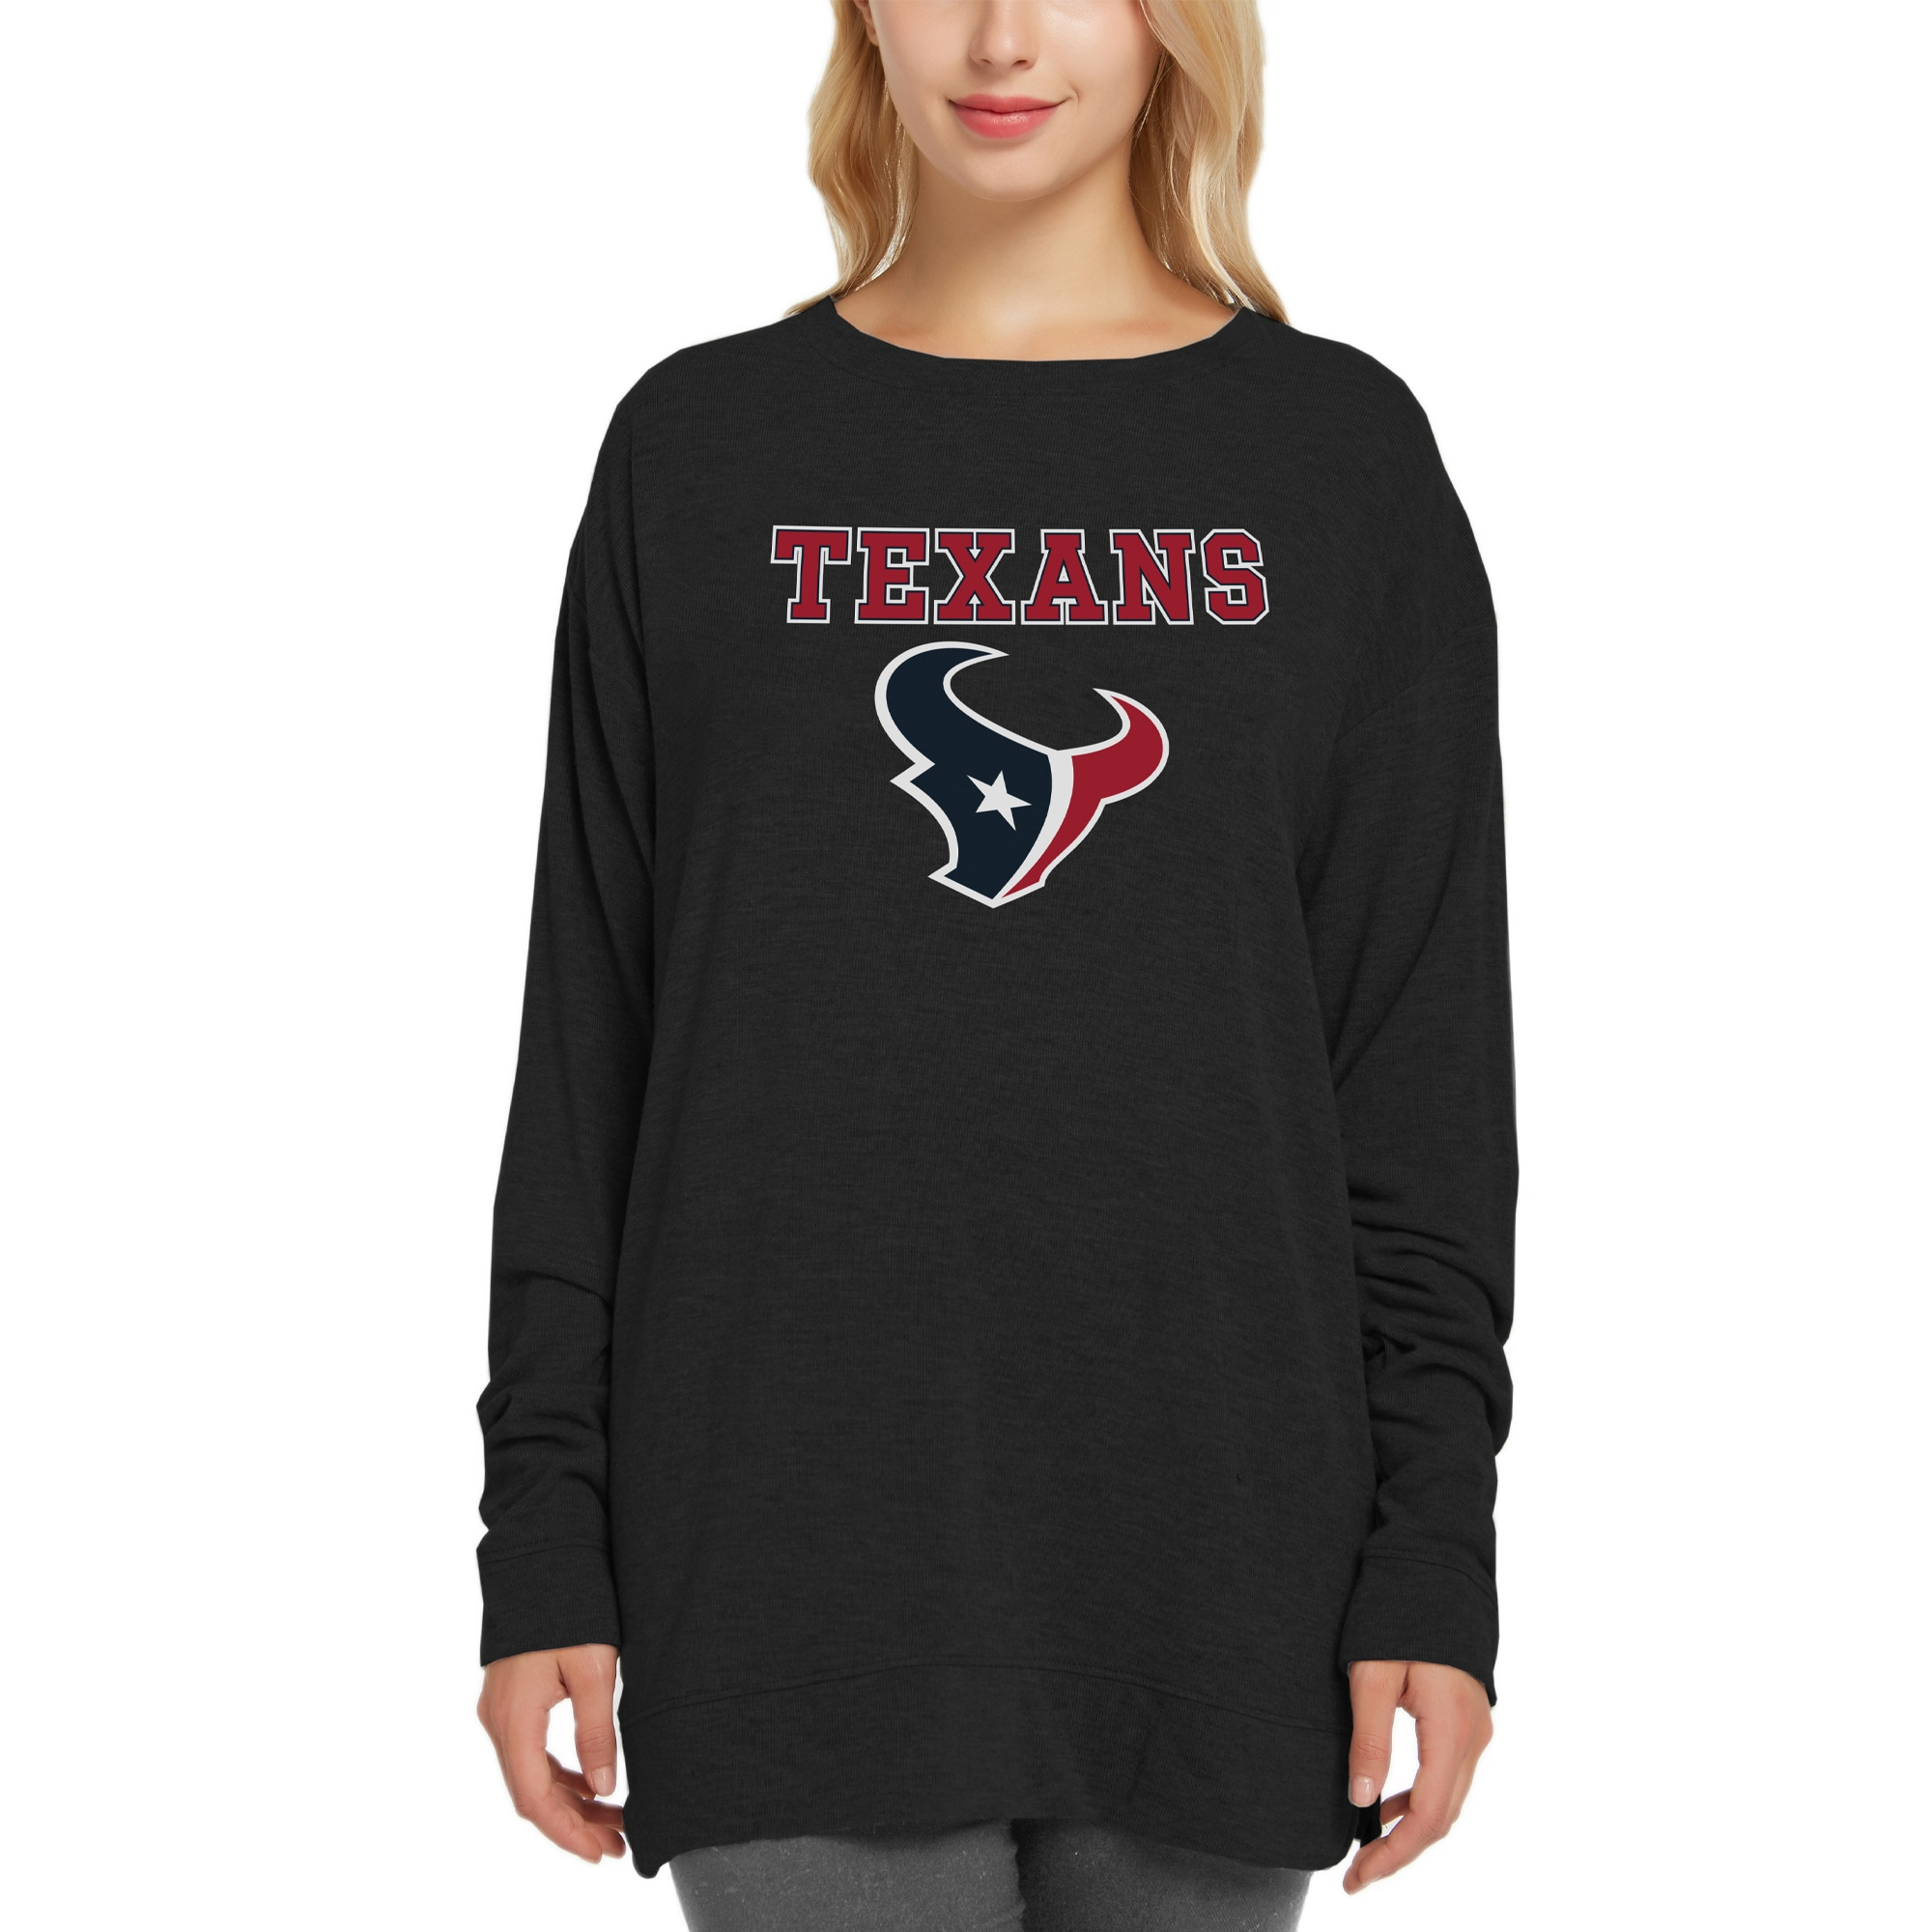 Houston Texans Concepts Sport Women's New Rapture Long Sleeve Top - Black